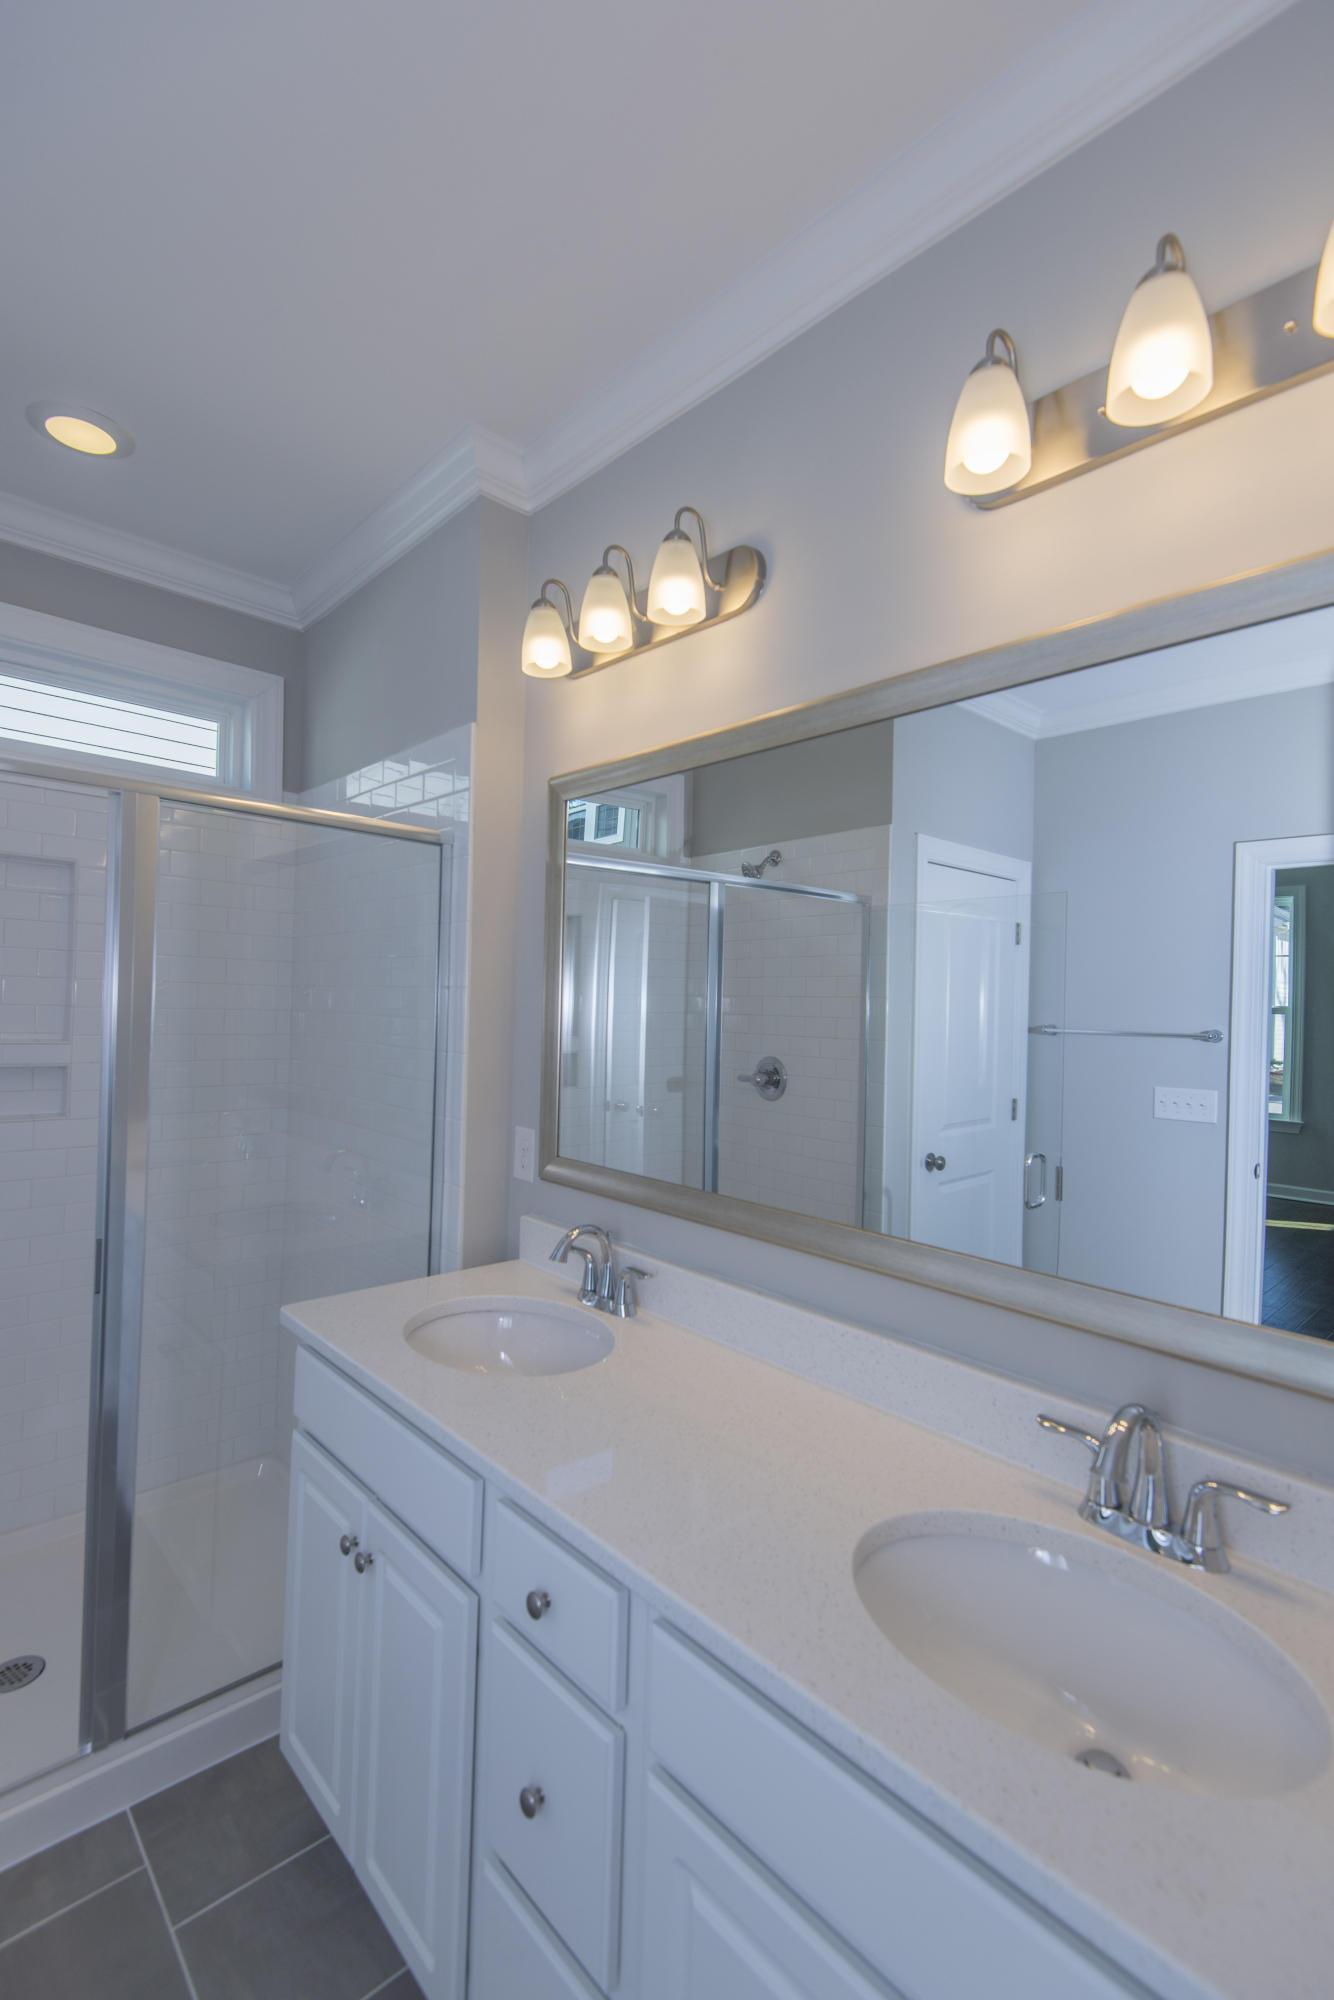 Magnolia Bluff Homes For Sale - 3120 Riverine, Charleston, SC - 55